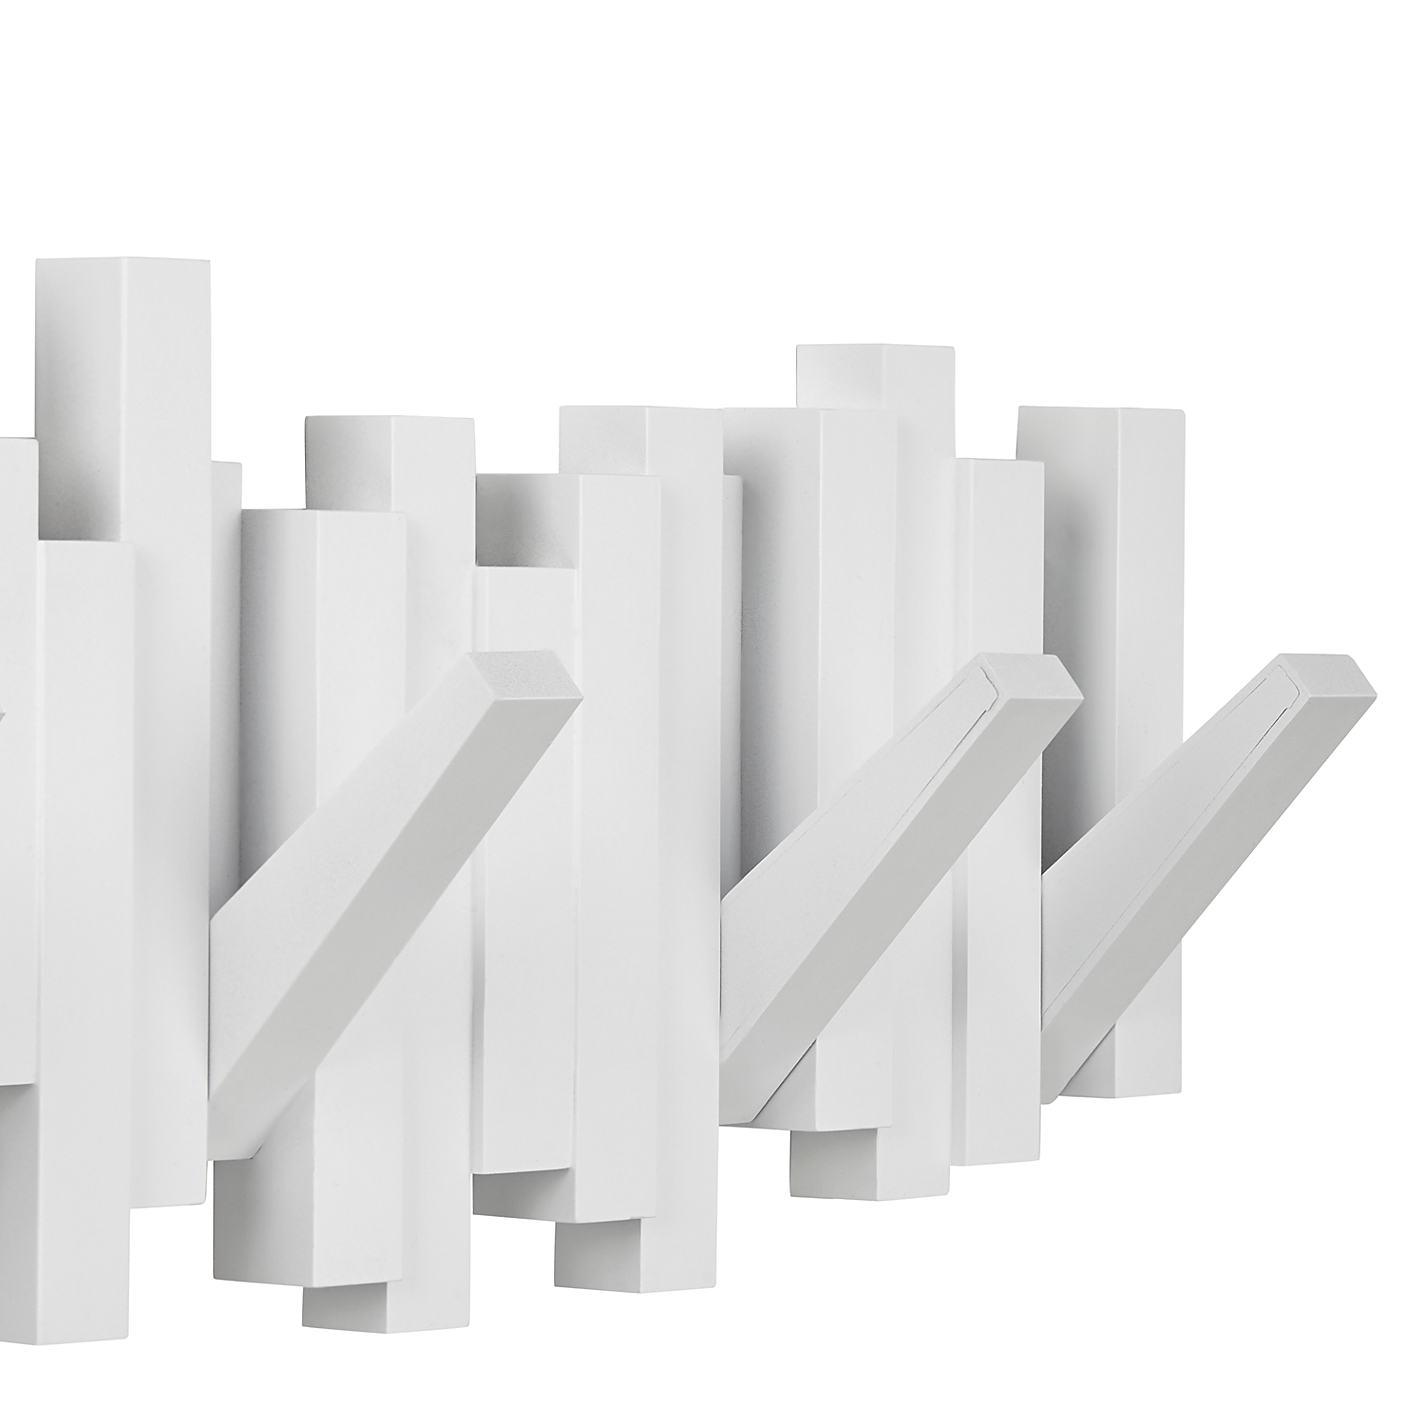 Perchero de pared multi sticks blanco orden en casa - Perchero pared blanco ...